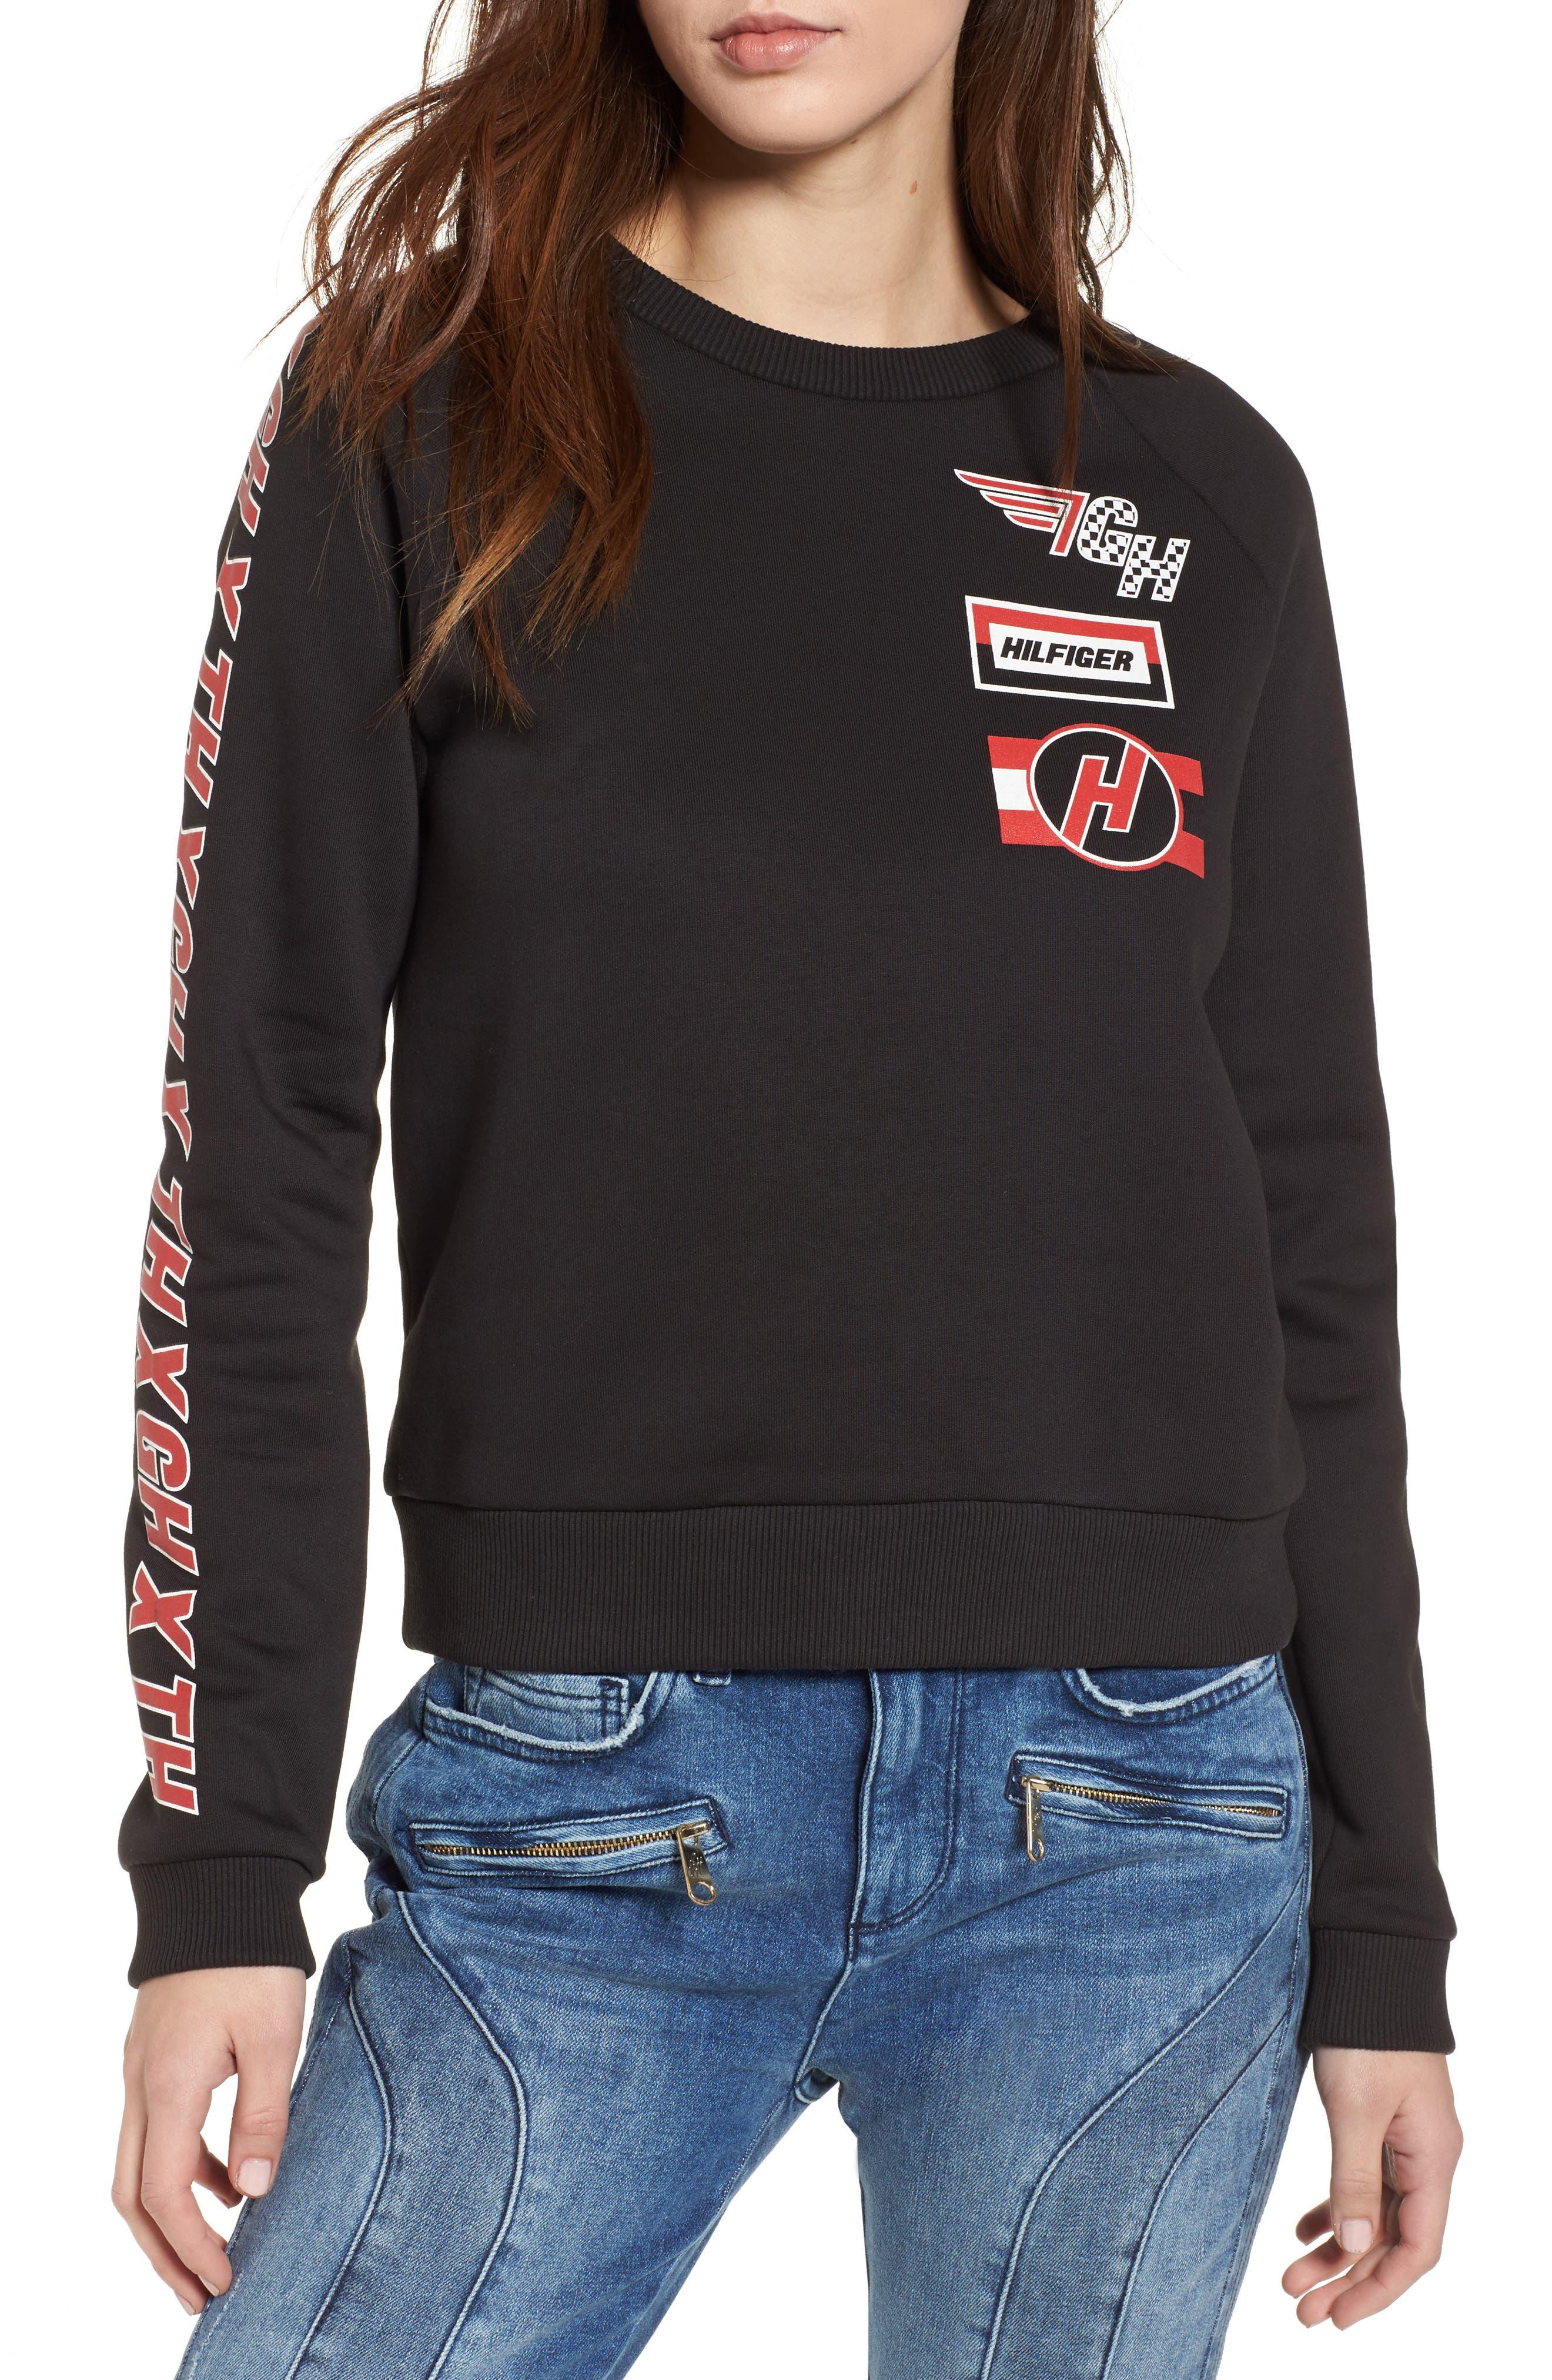 x Gigi Hadid Team Sweatshirt,                         Main,                         color, Black Beauty